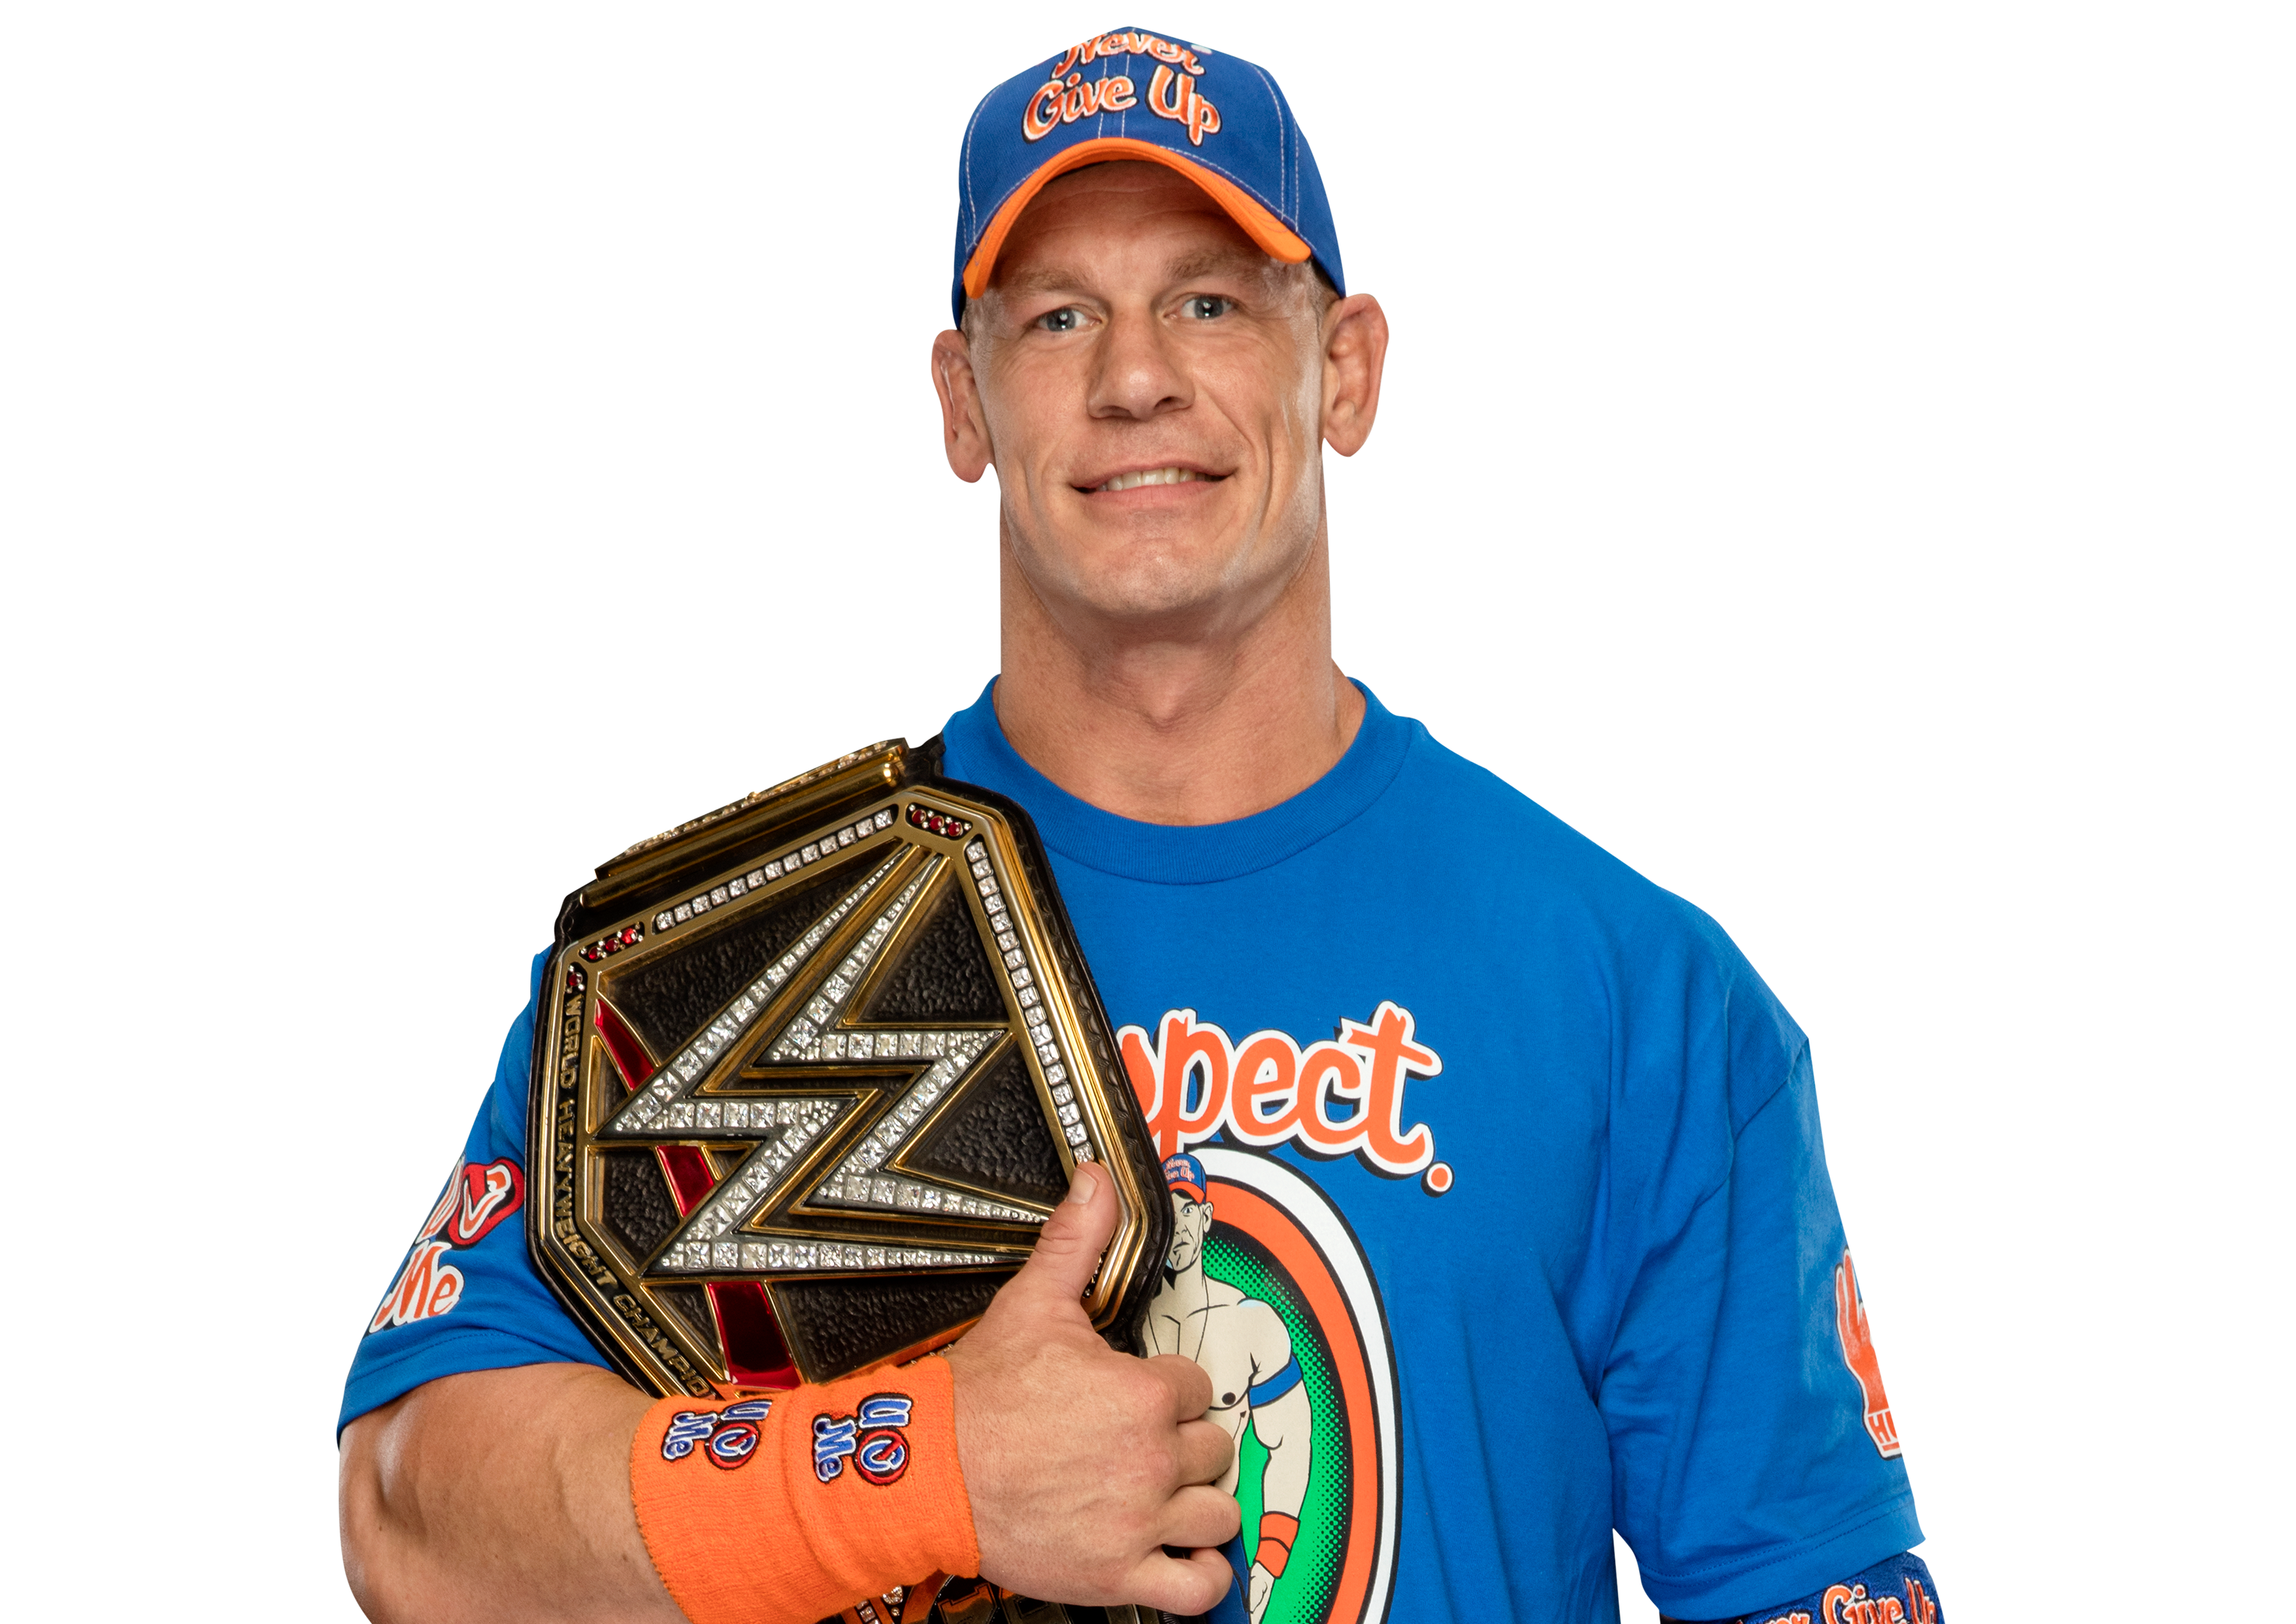 John Cena John Cena Wwe Champion John Cena Wwe Champions